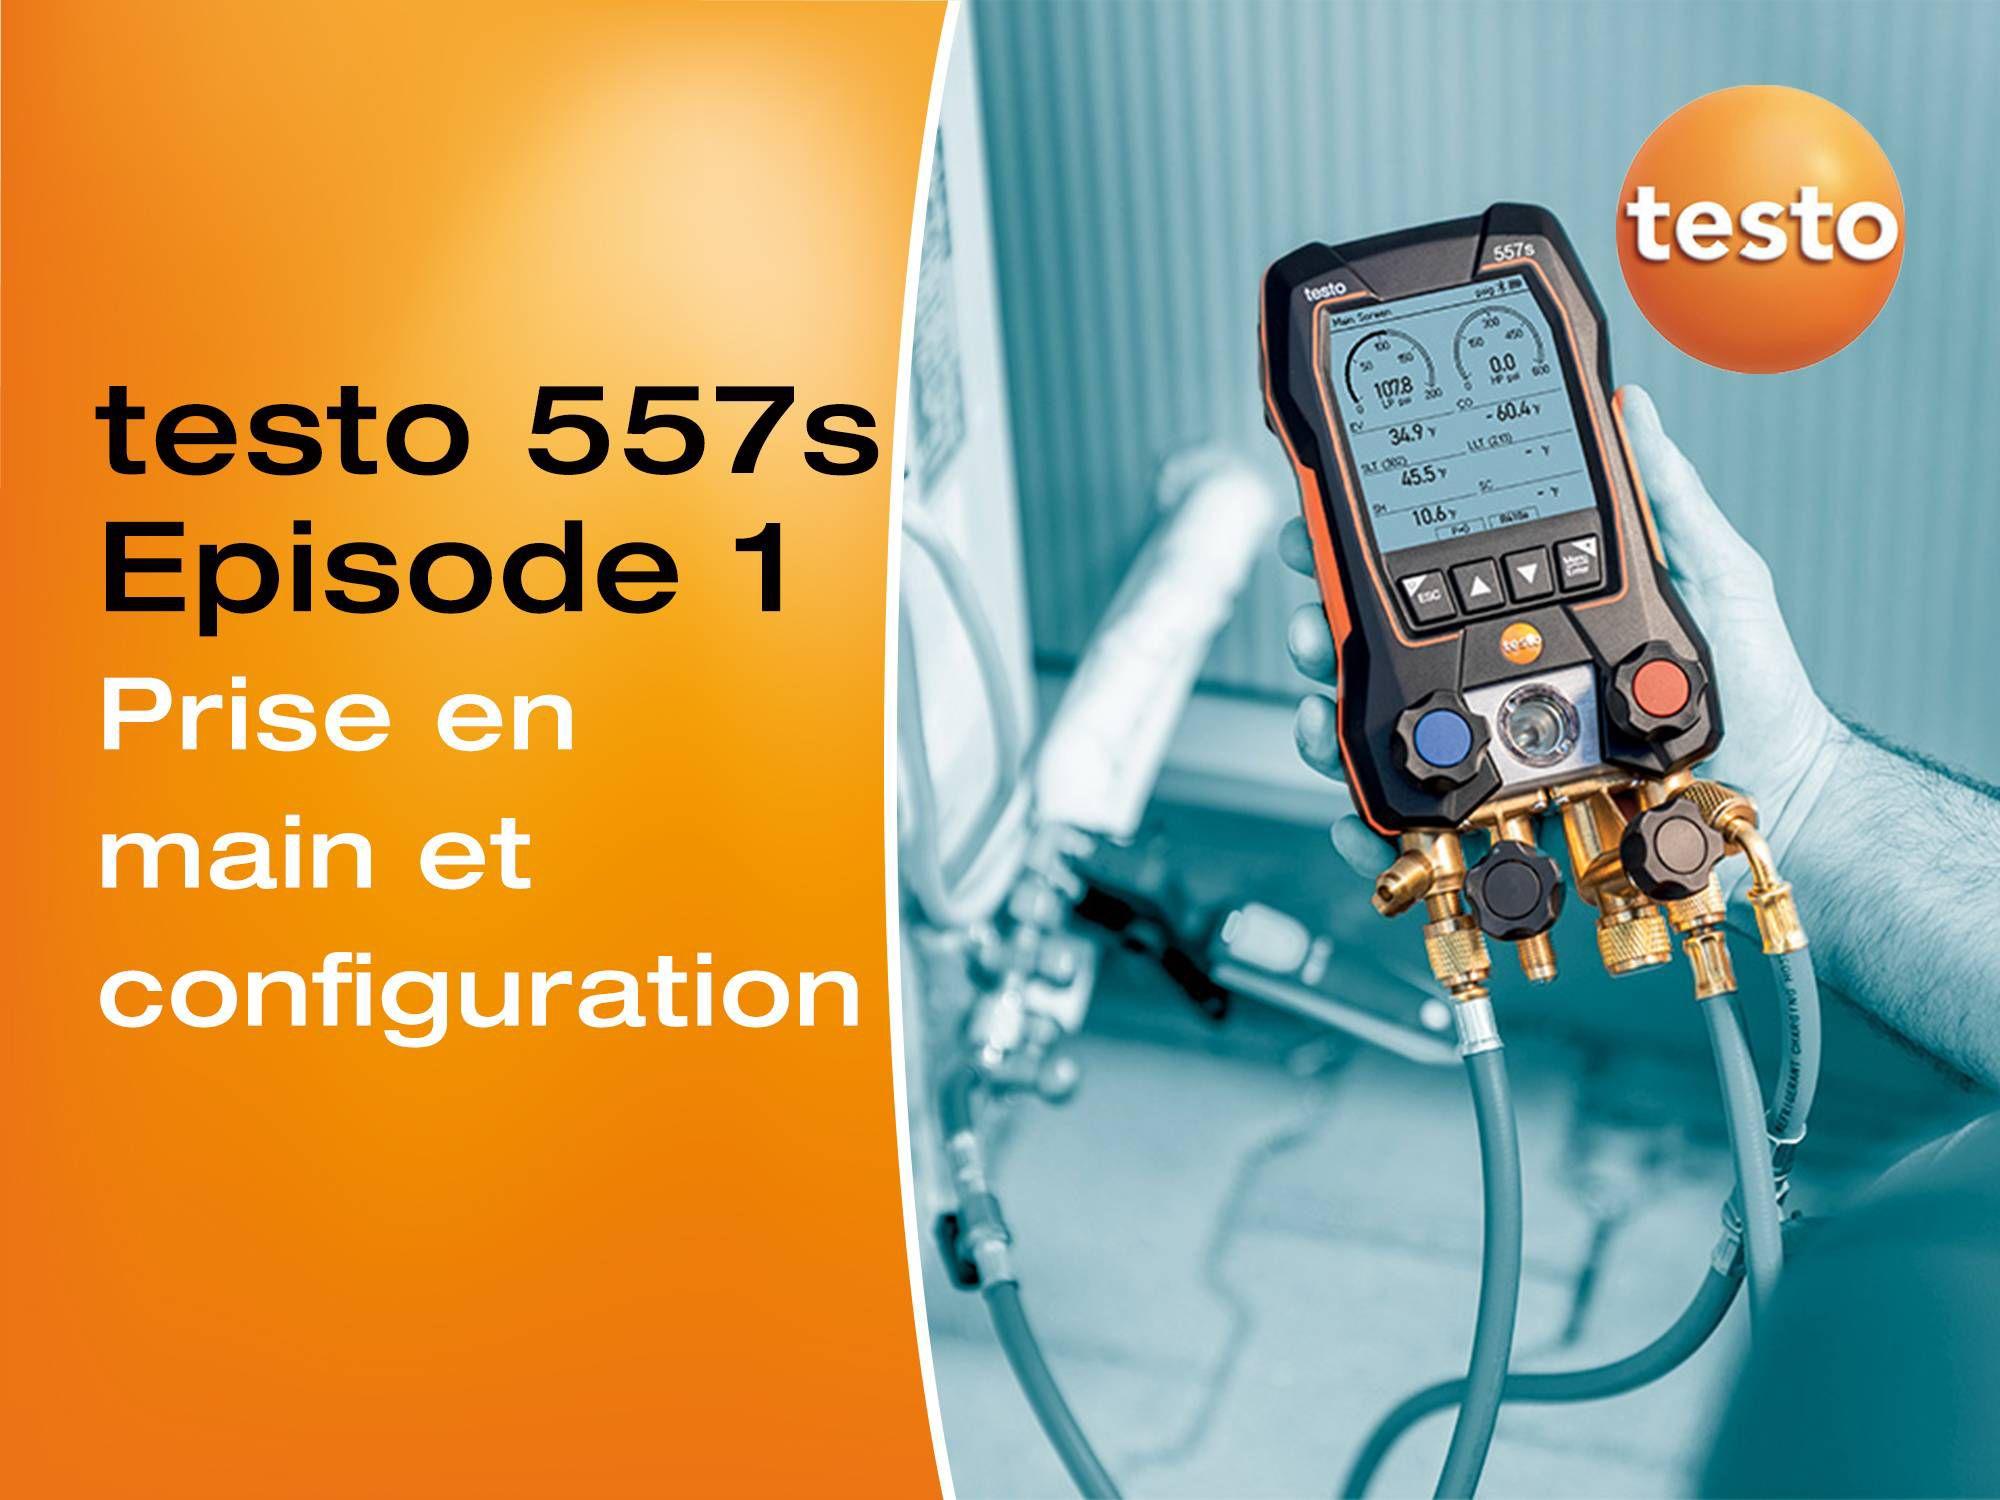 Tutoriel vidéo prise en main de nouveau manomètre digital testo 557s